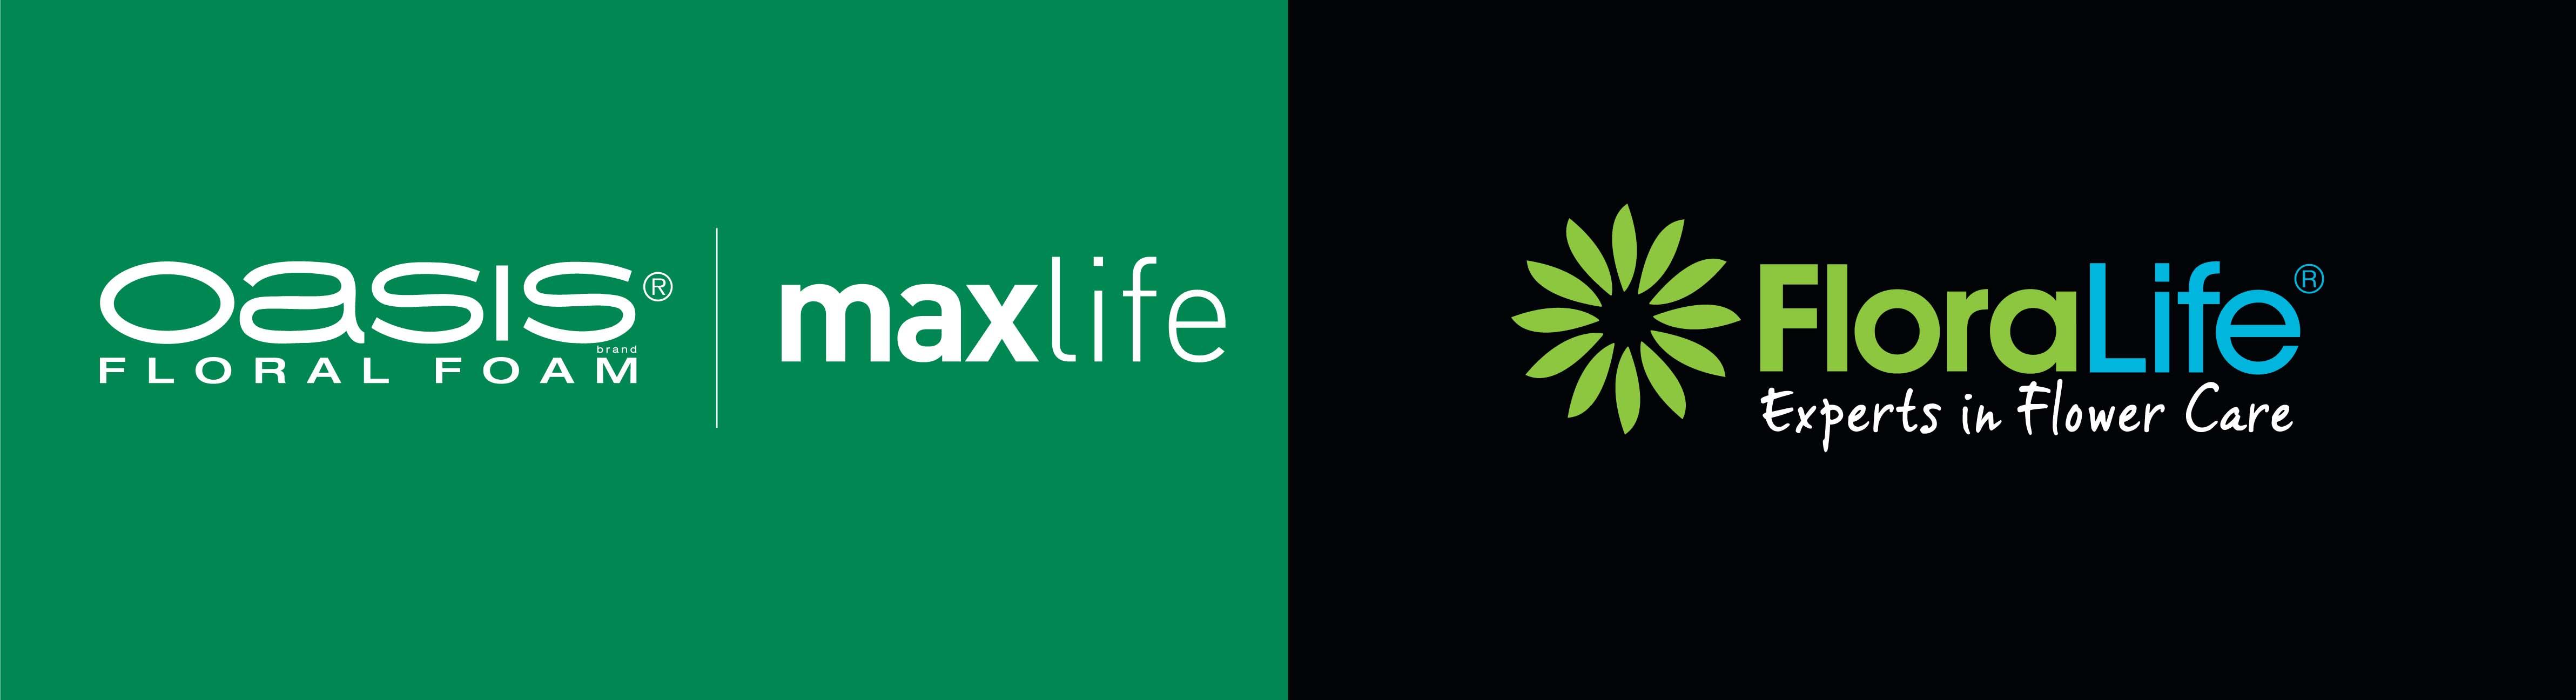 Sticker_maxlife+Floralife(zwart)_50x200mm (hxb).indd